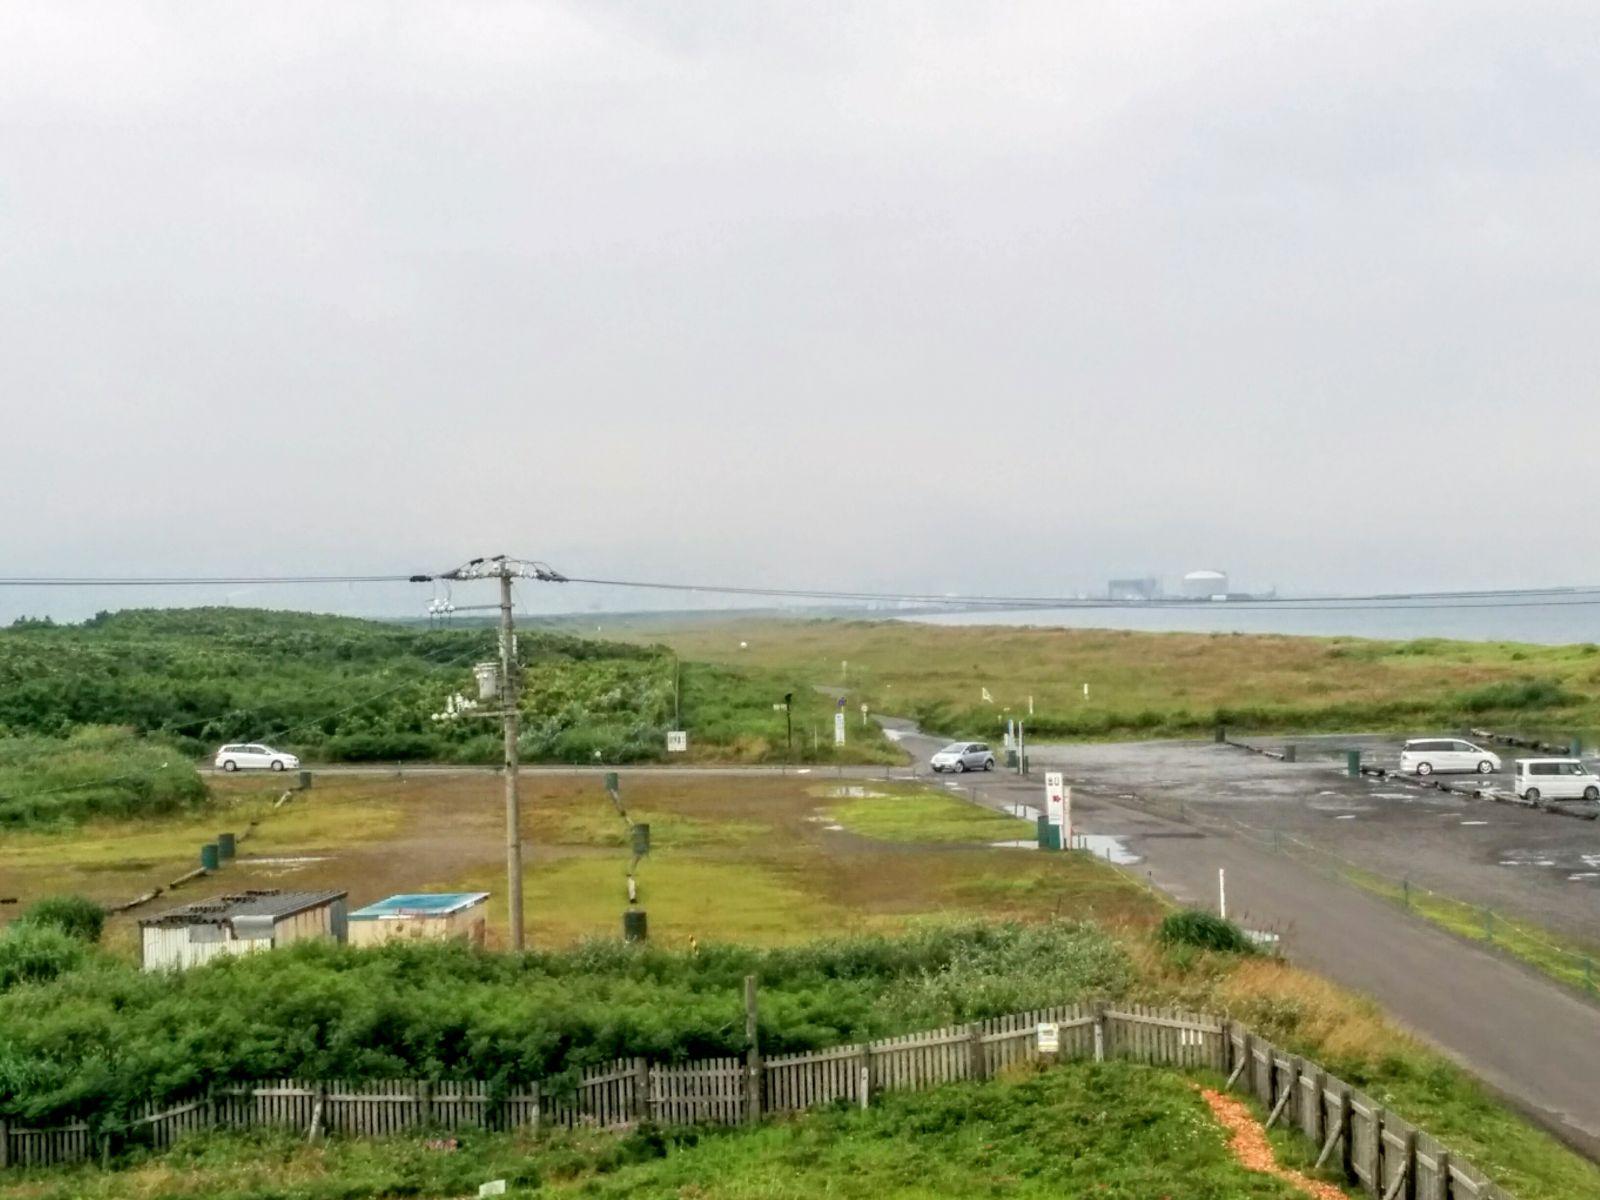 【石狩市】石狩浜海岸観光案内です。